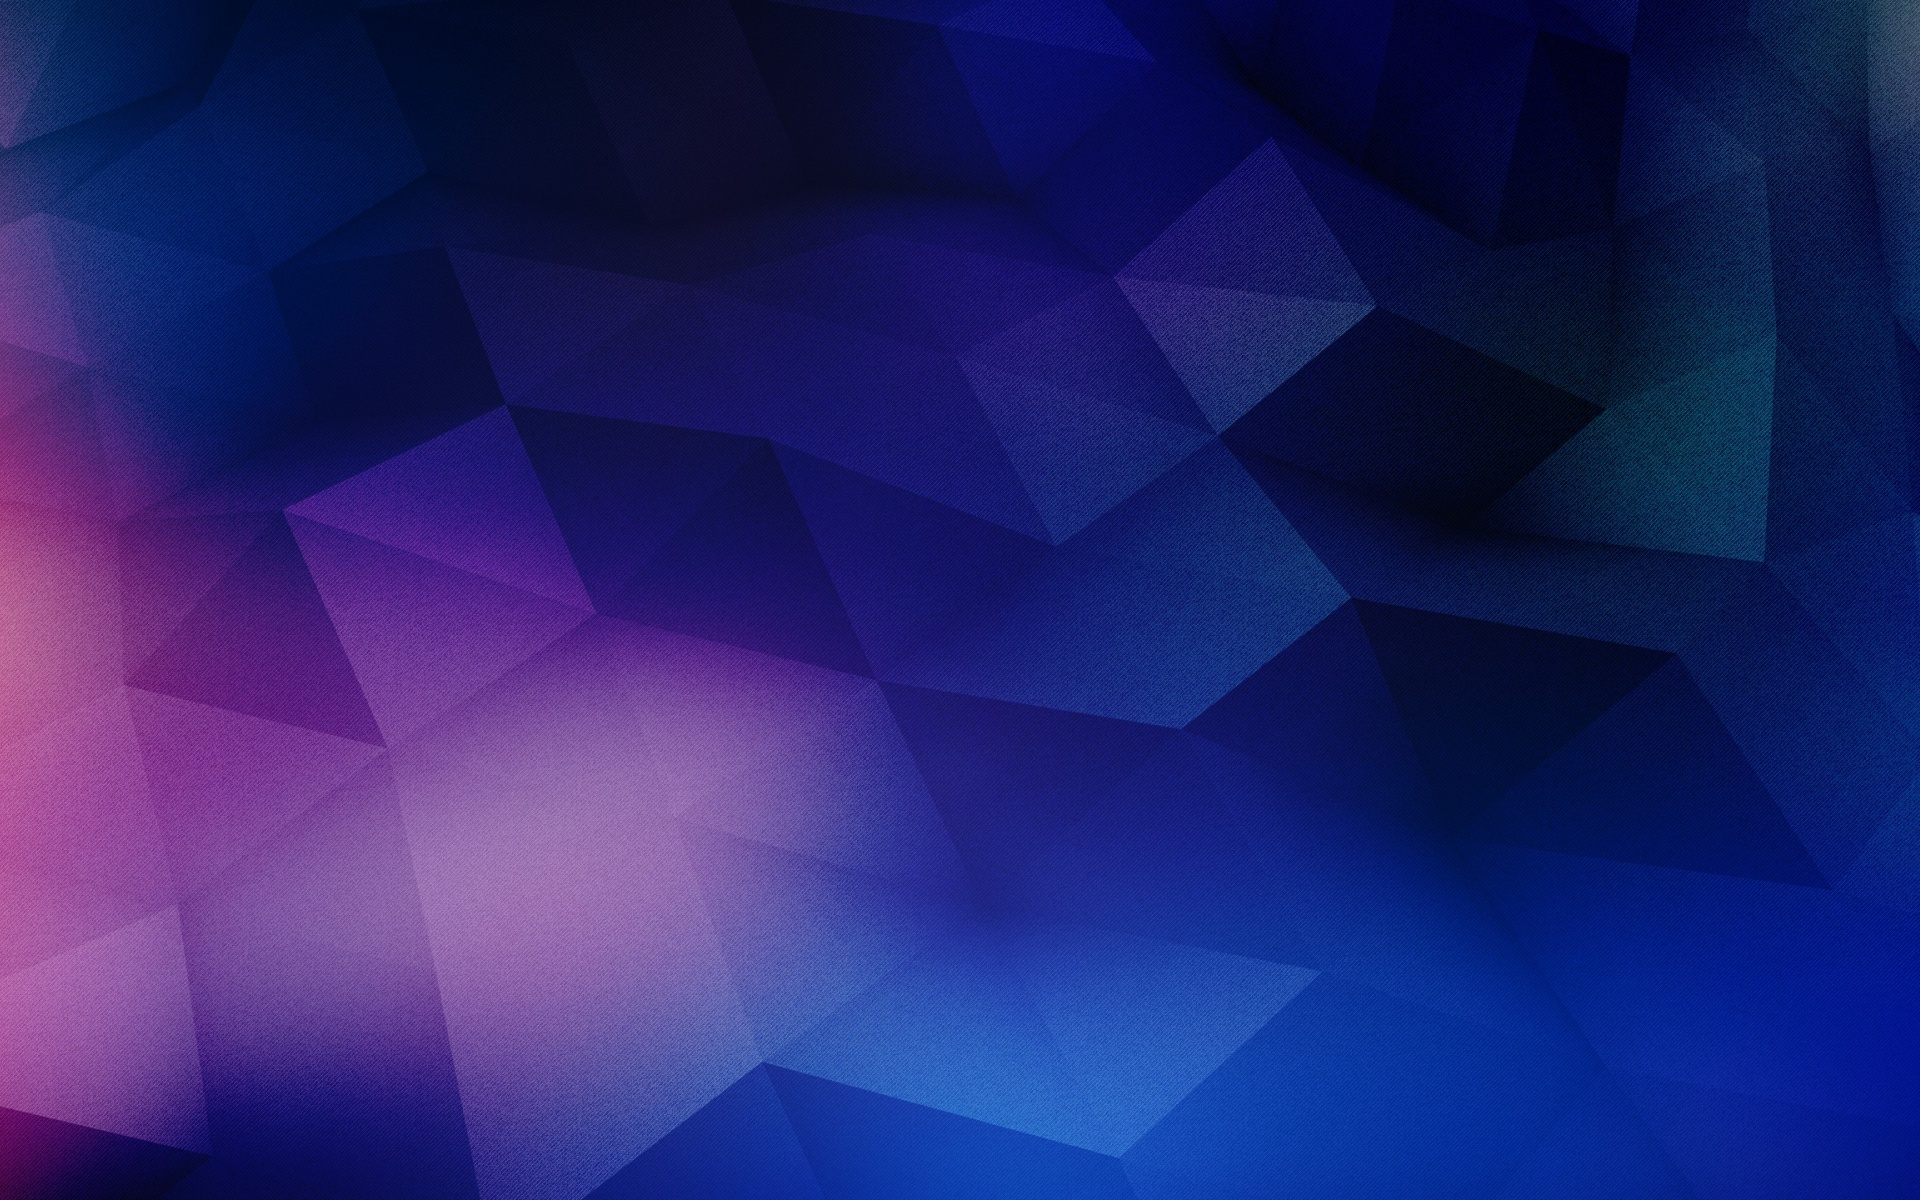 1920x1200 Geometric purple shapes blue desktop PC and Mac wallpaper 1920x1200